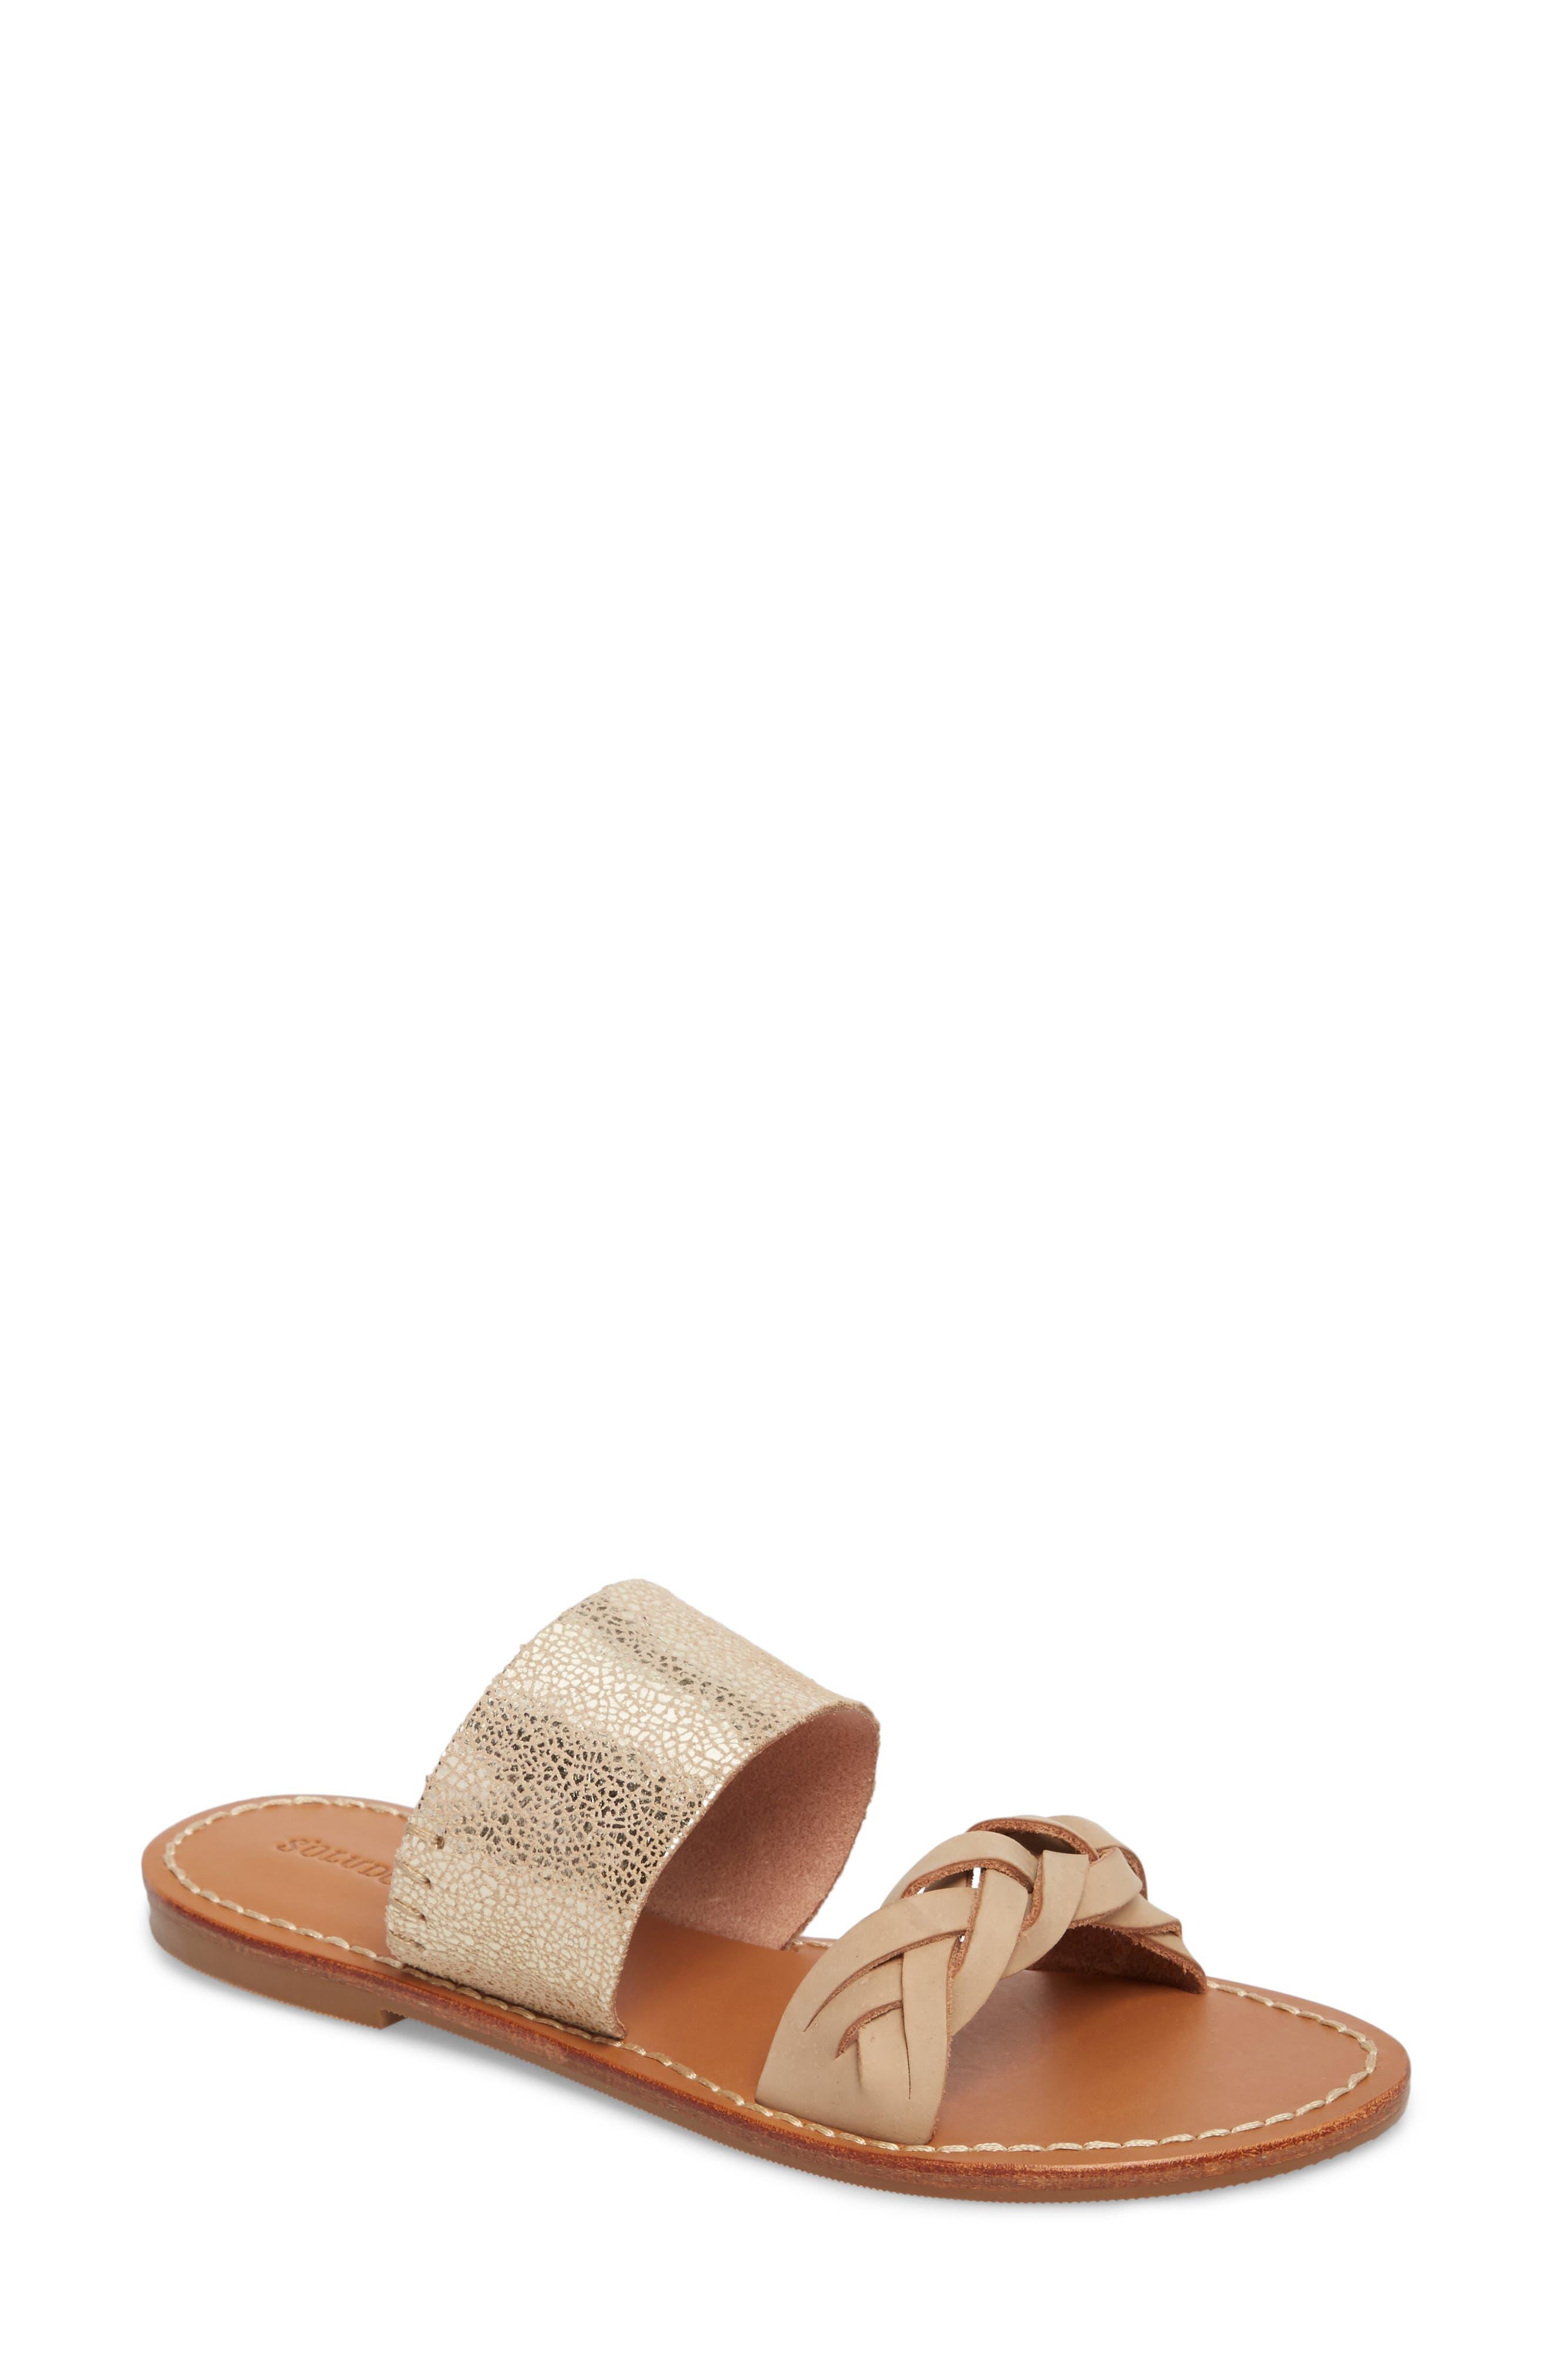 Slide Sandal,                         Main,                         color, NUDE/ PALE GOLD LEATHER